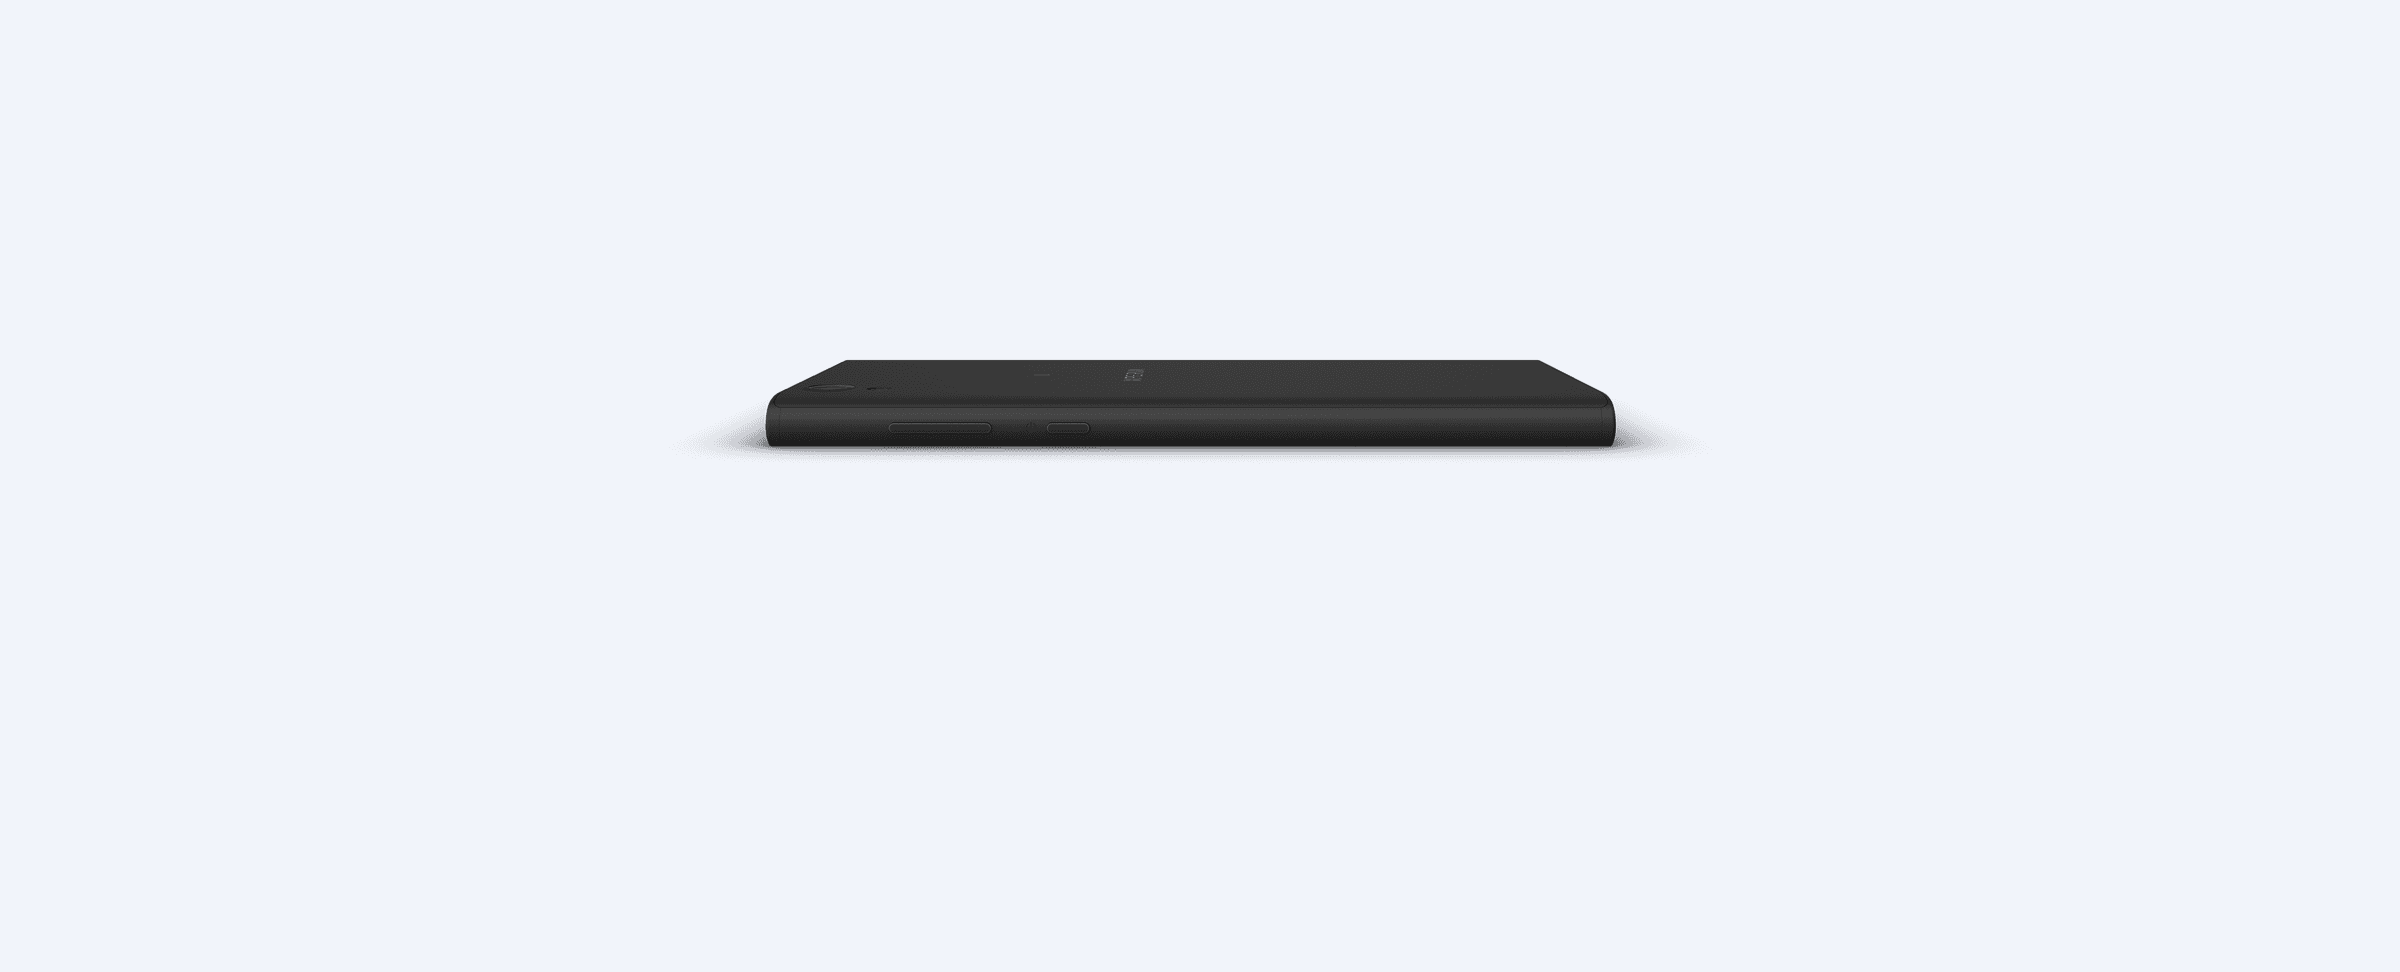 Sony Xperia L1 5